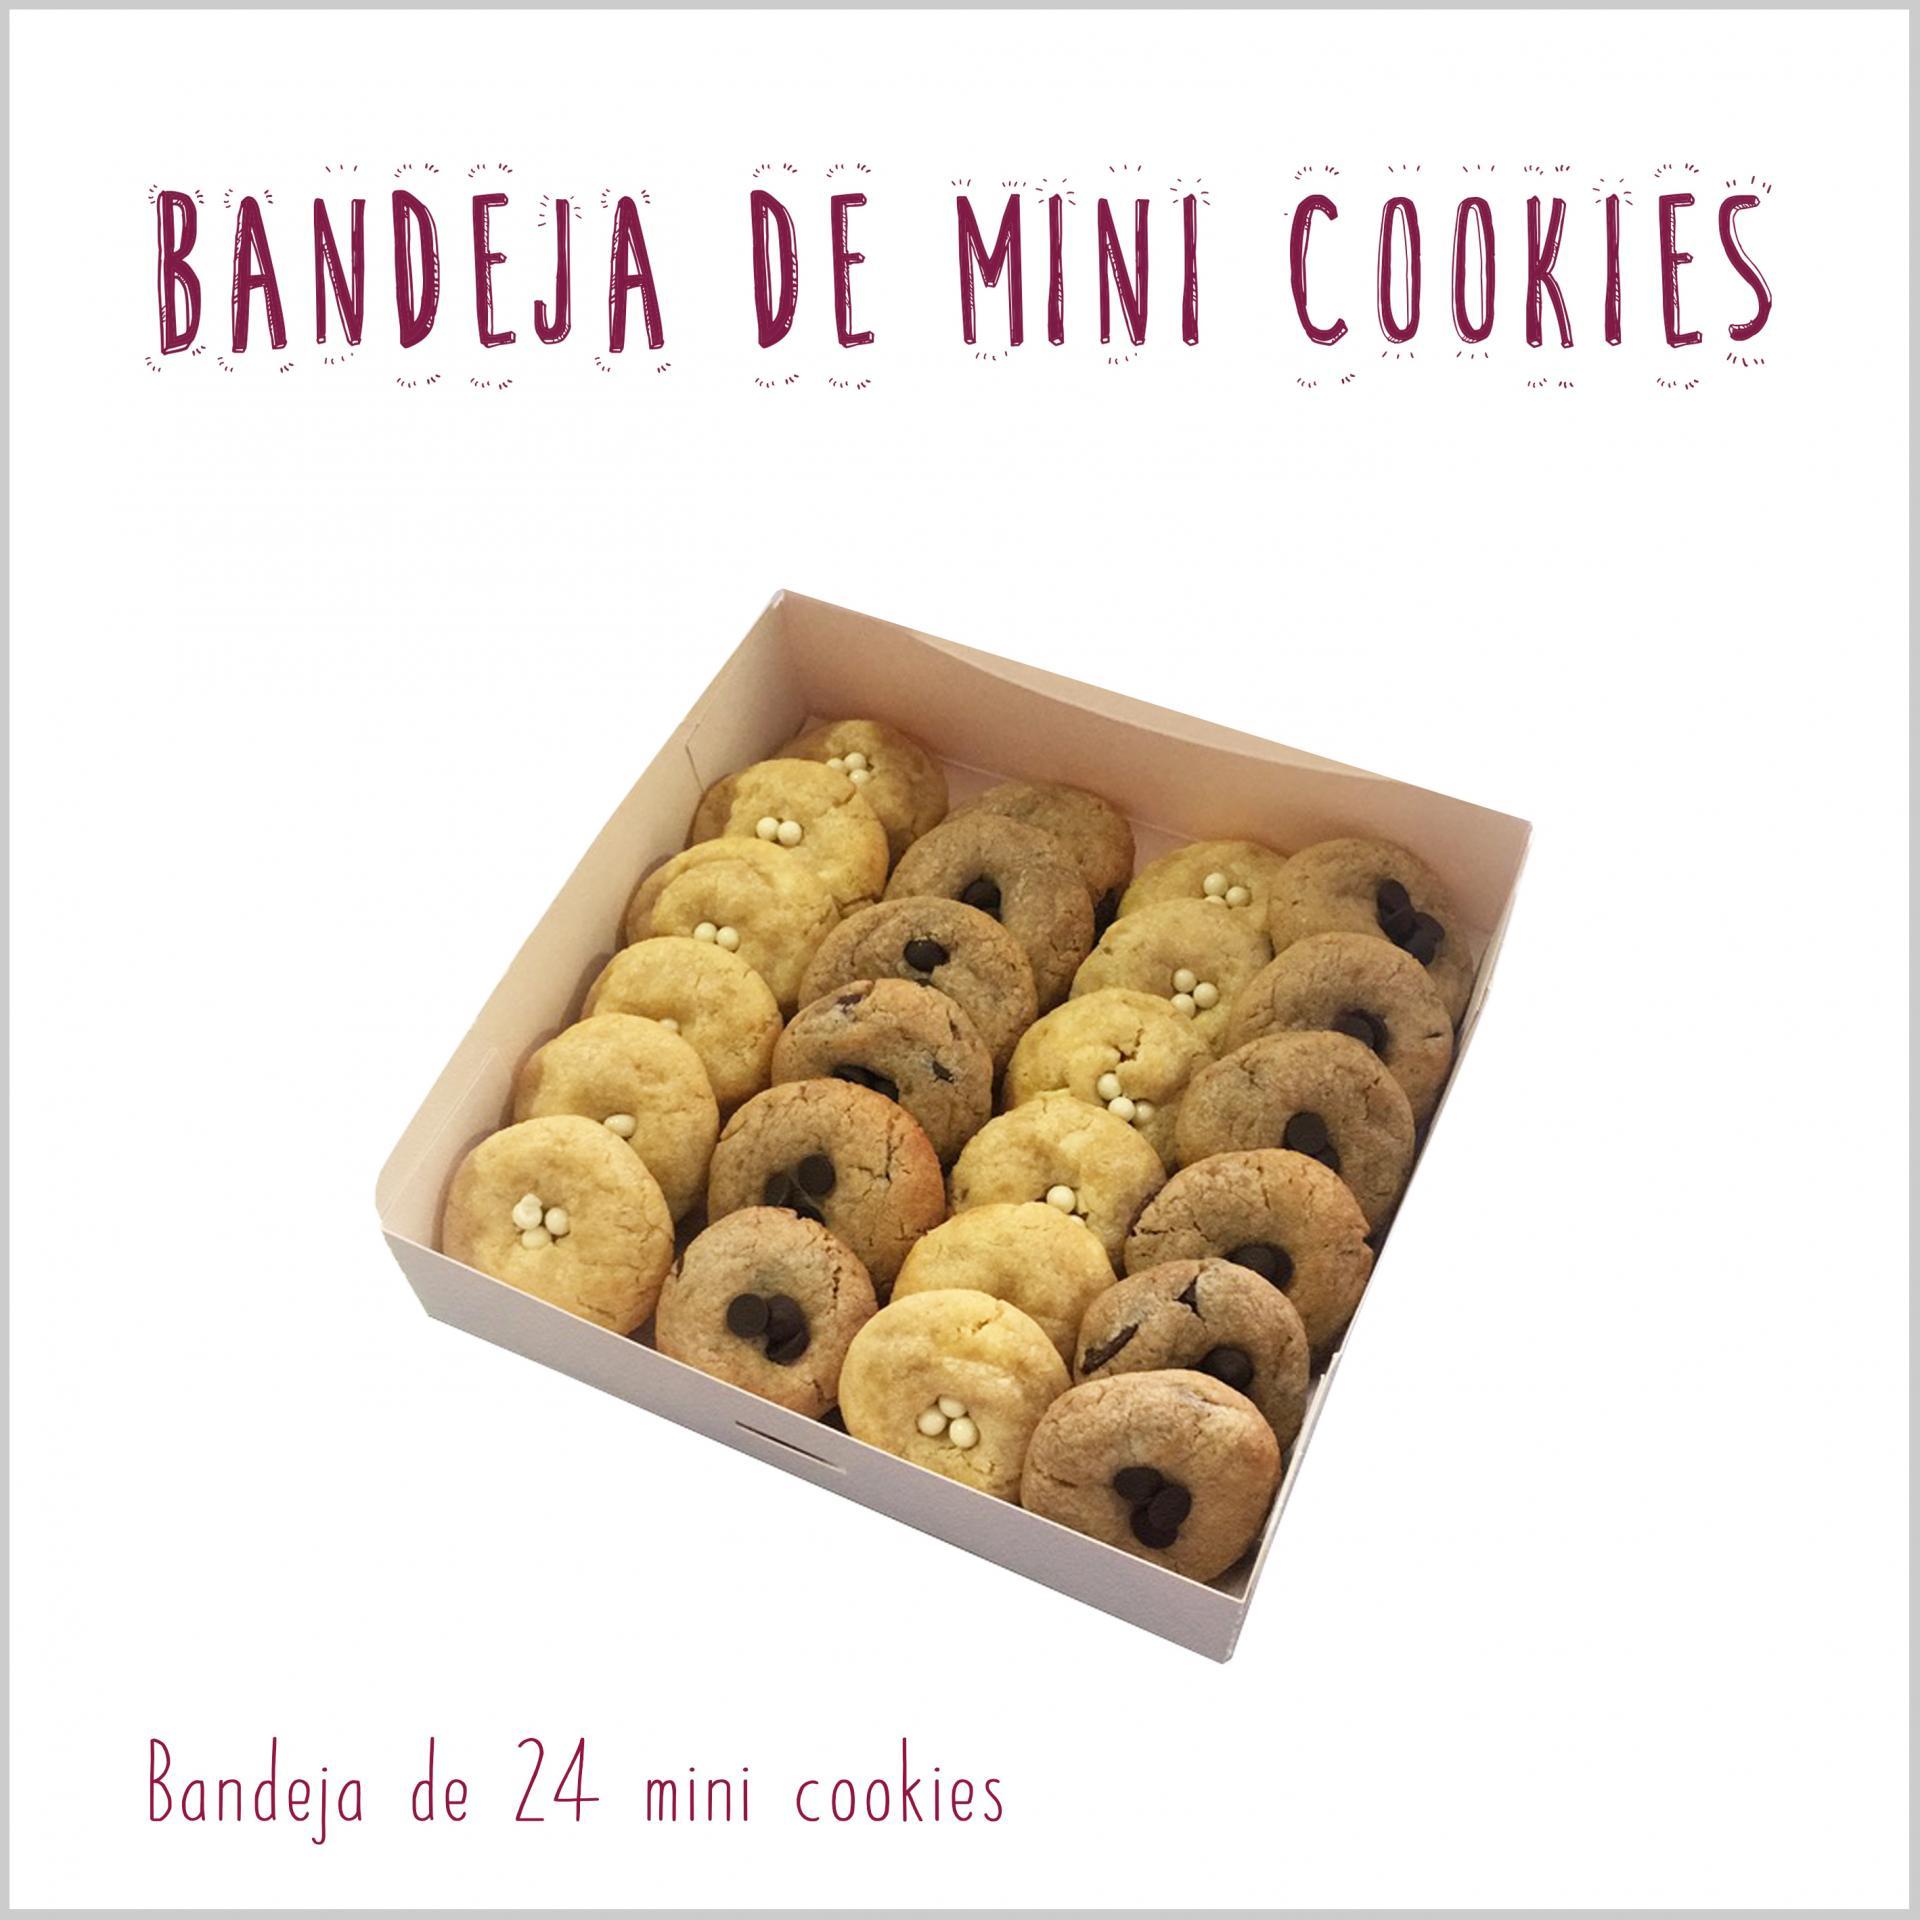 Bandeja de mini cookies